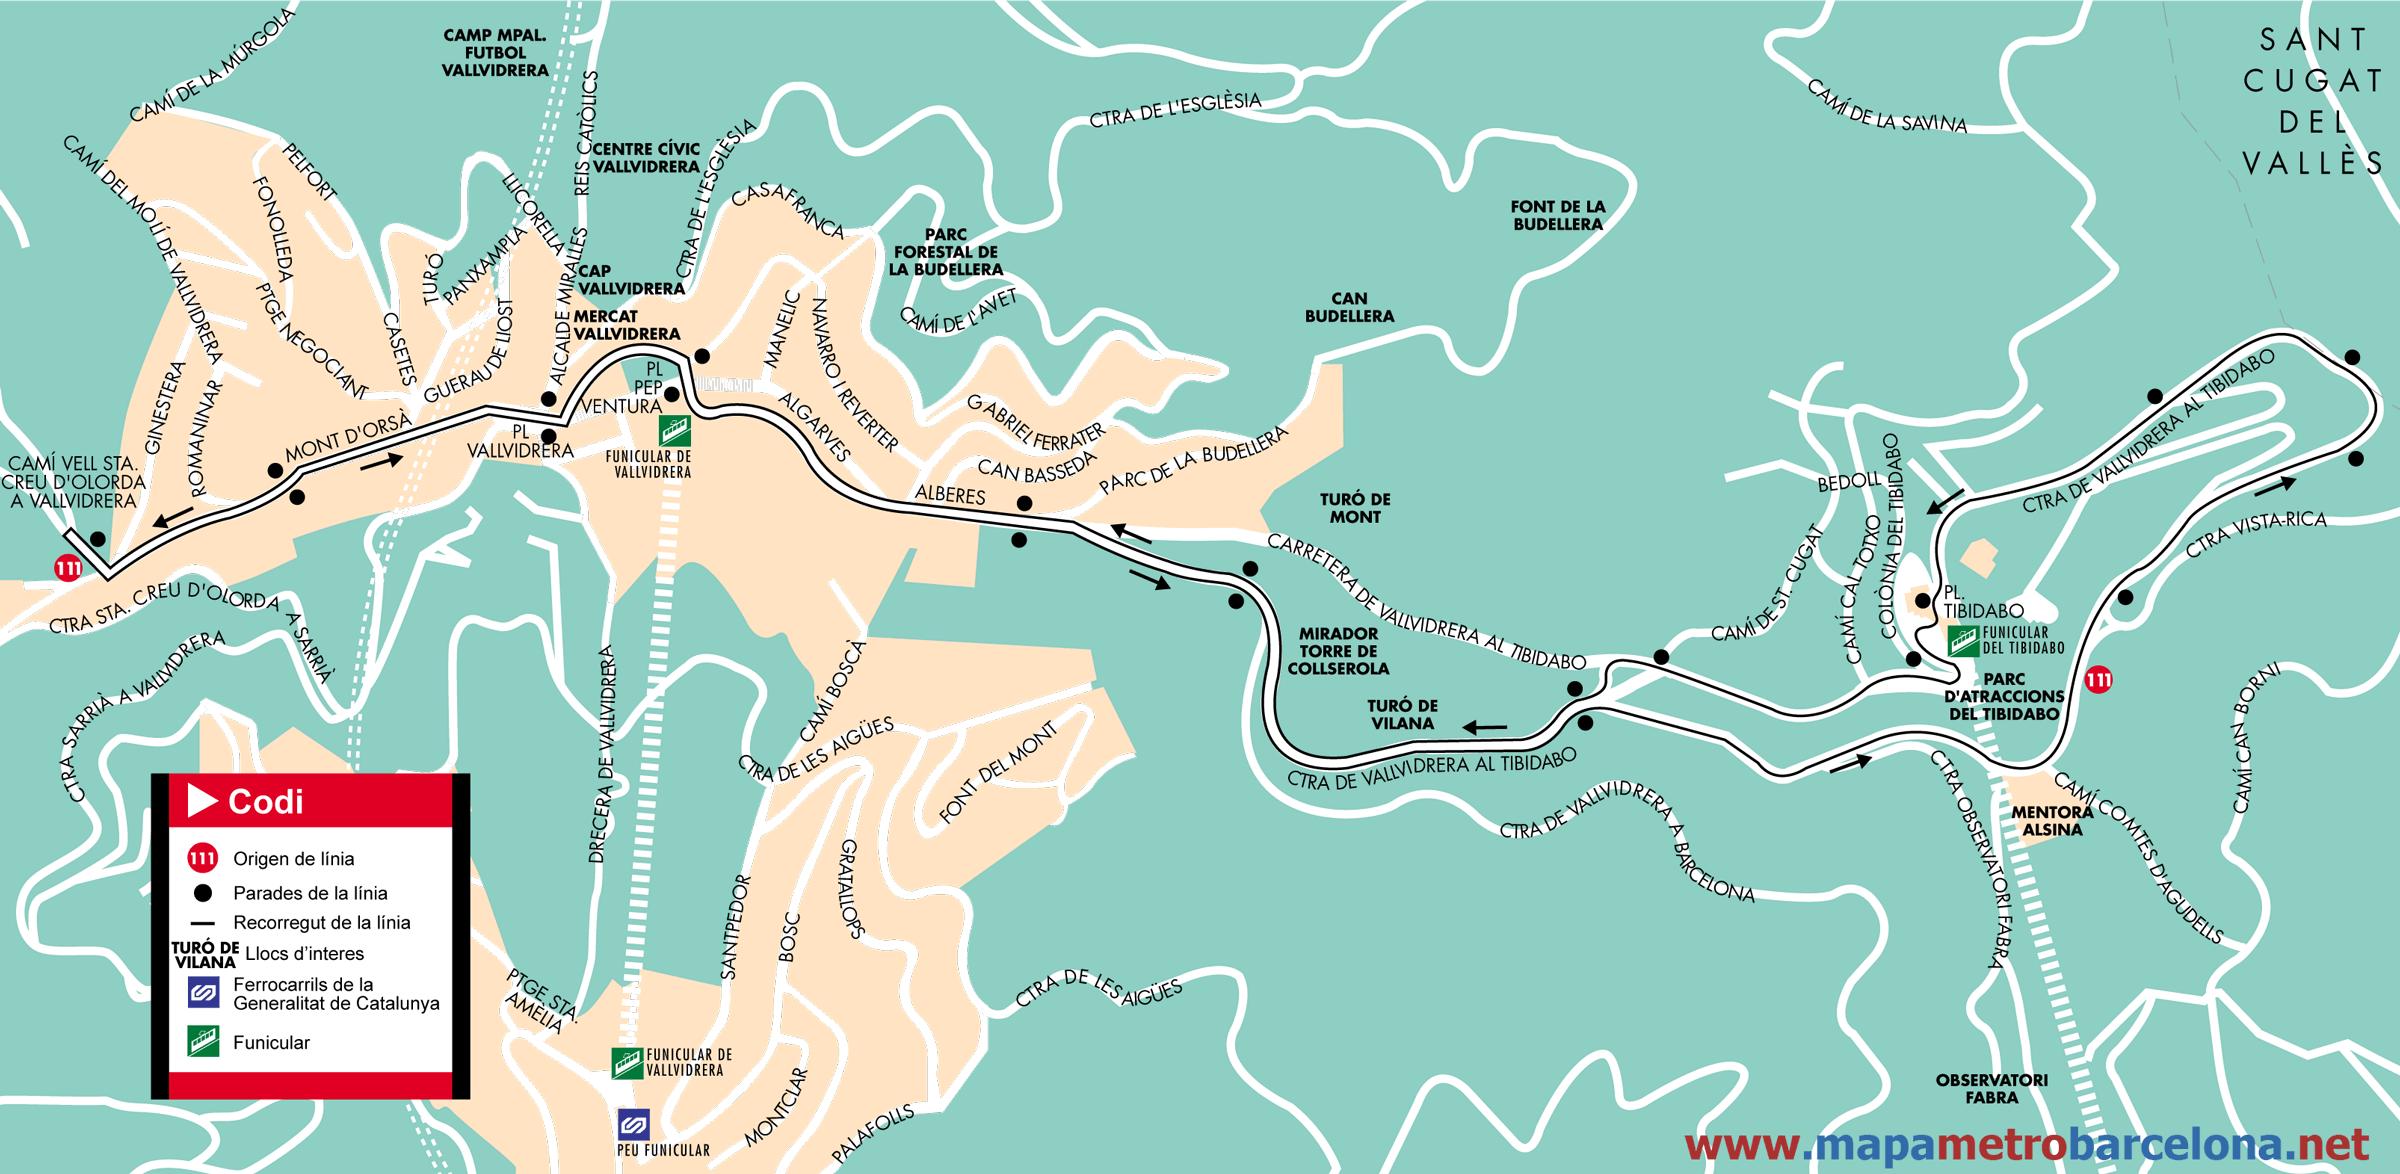 Image gallery tibidabo map - Placa kennedy barcelona ...